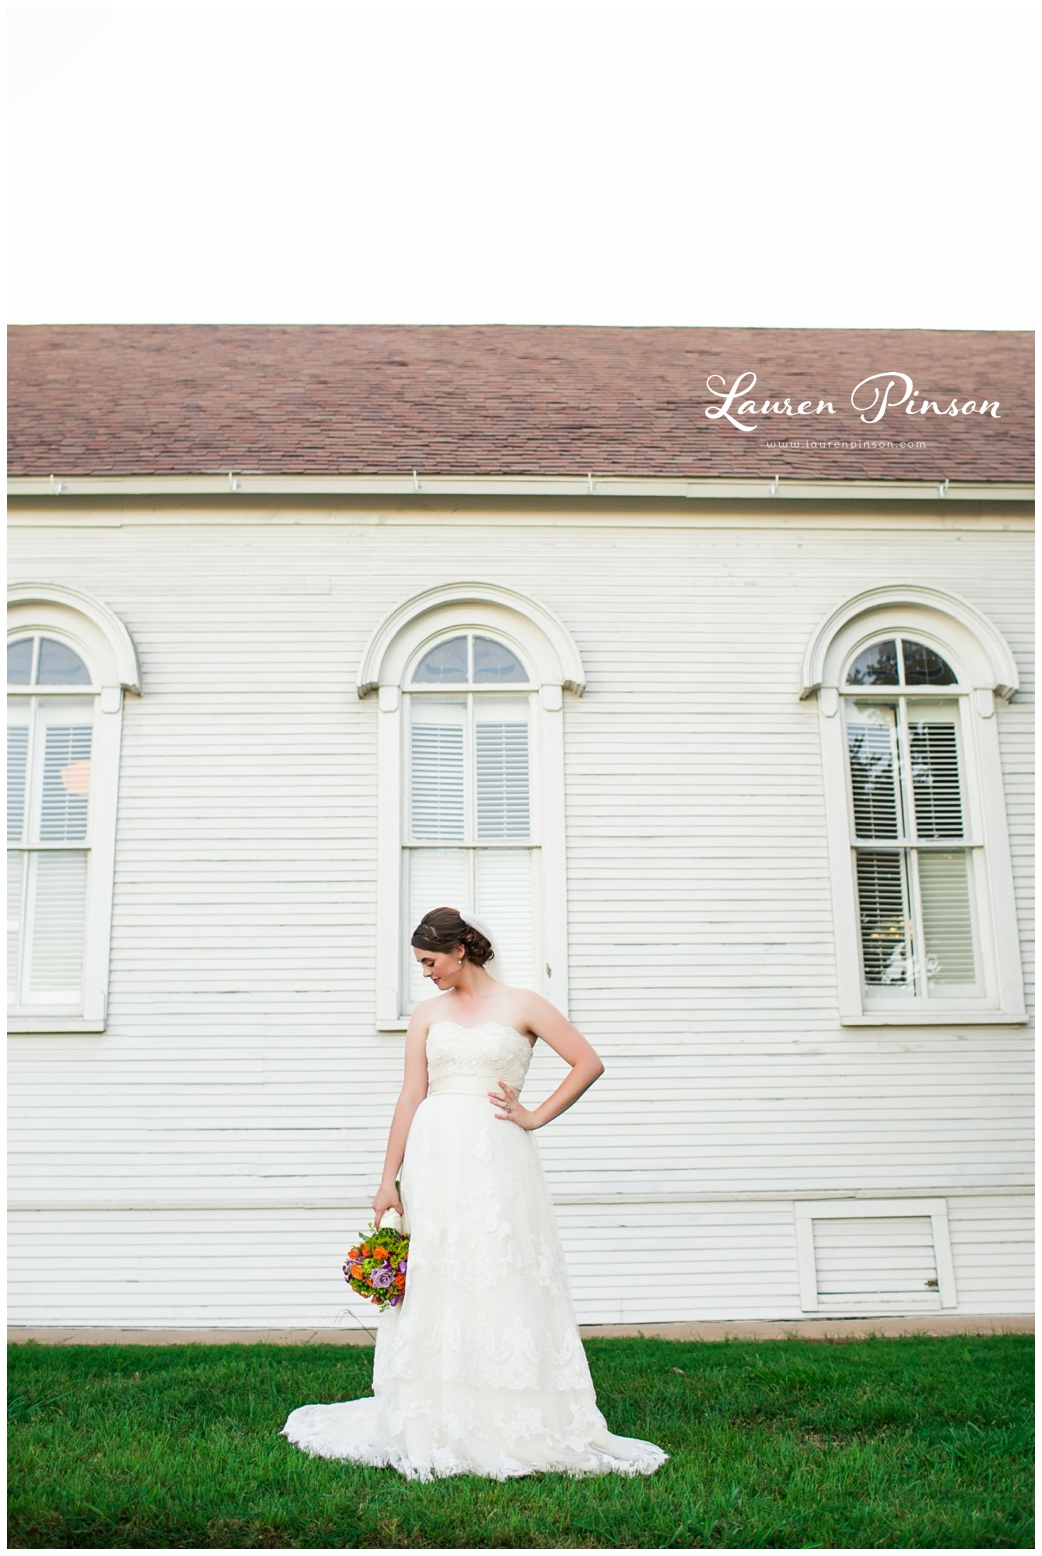 chestnut-square-downtown-mckinney-texas-wedding-photographer-sherman-northtexas-bridal-portraits-photography_0223.jpg